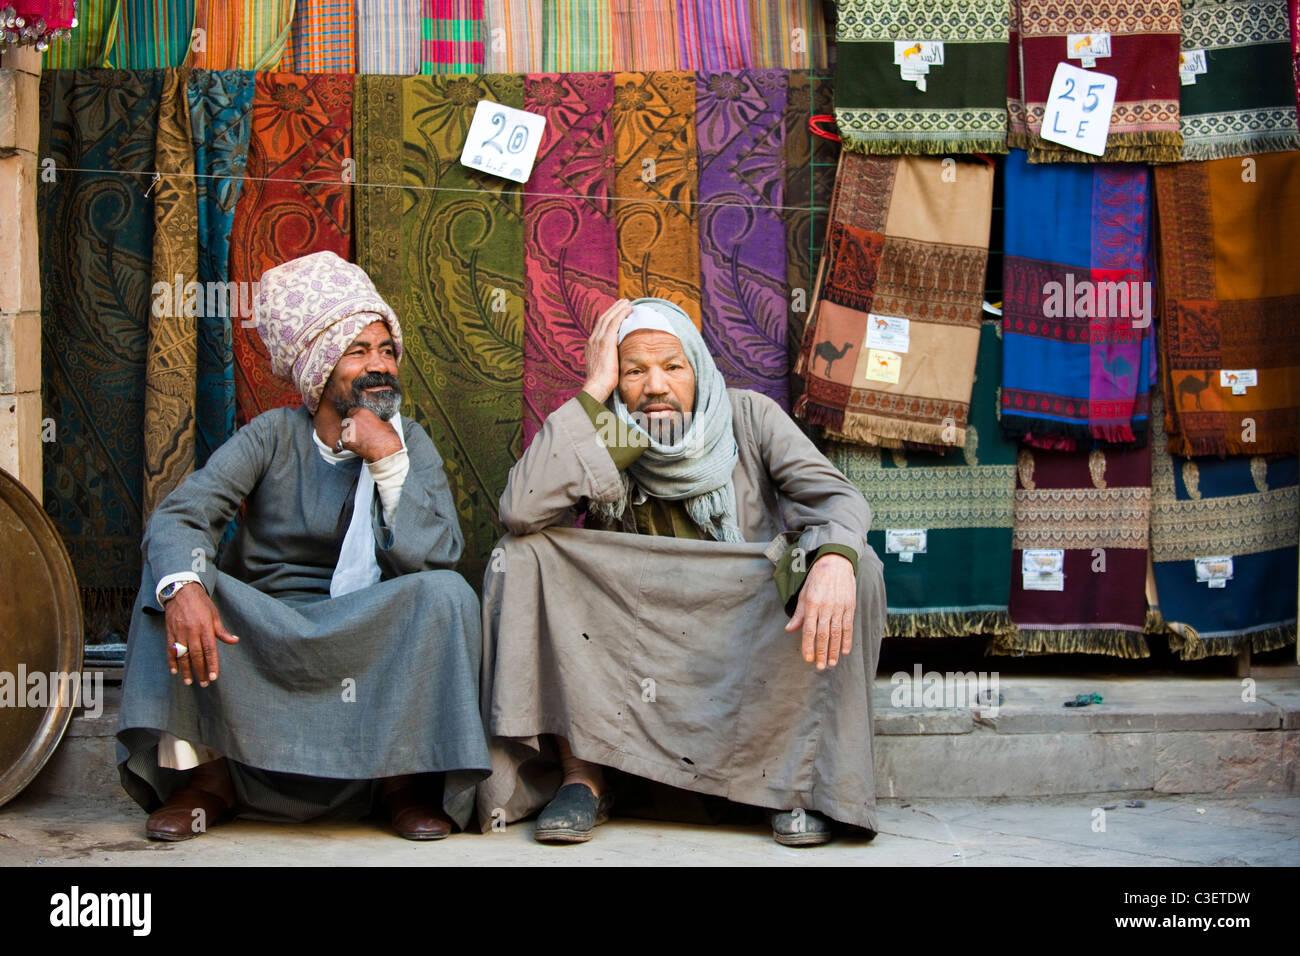 Aegypten, Luxor, Souk de GI Photo Stock